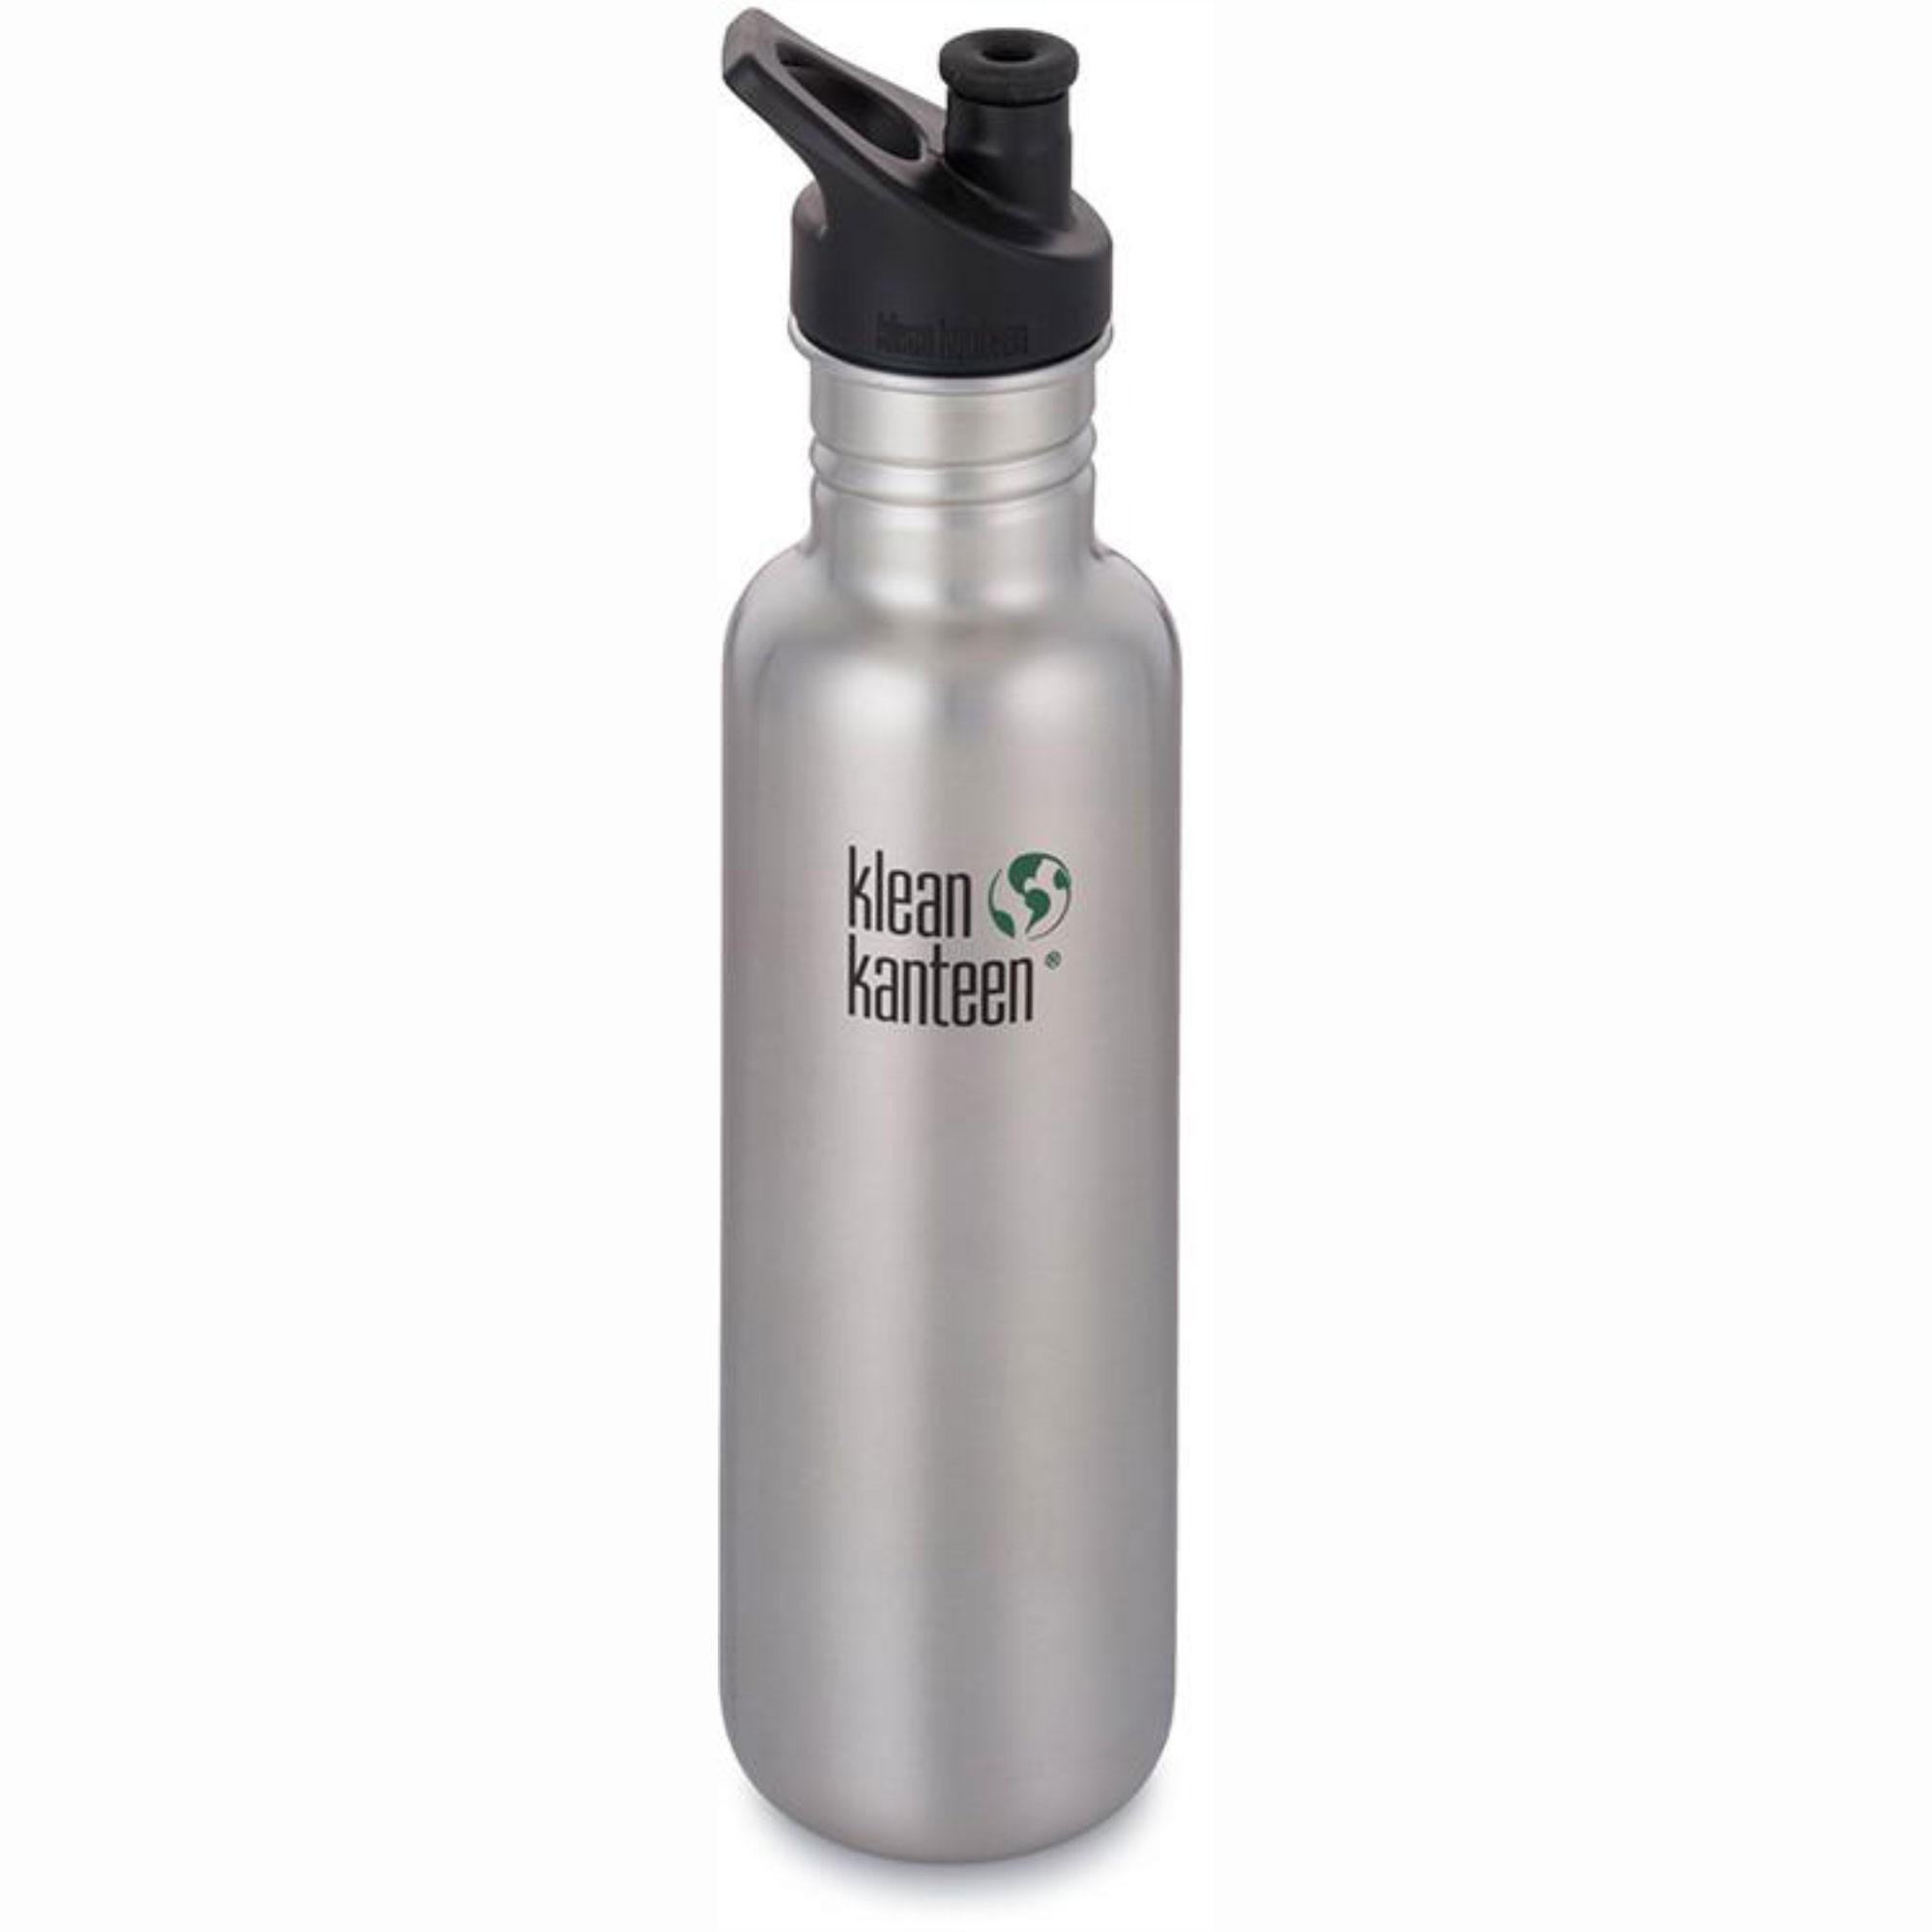 Klean Kanteen Classic Single Wall Loop Bottle 800ml - Brushed Stainless